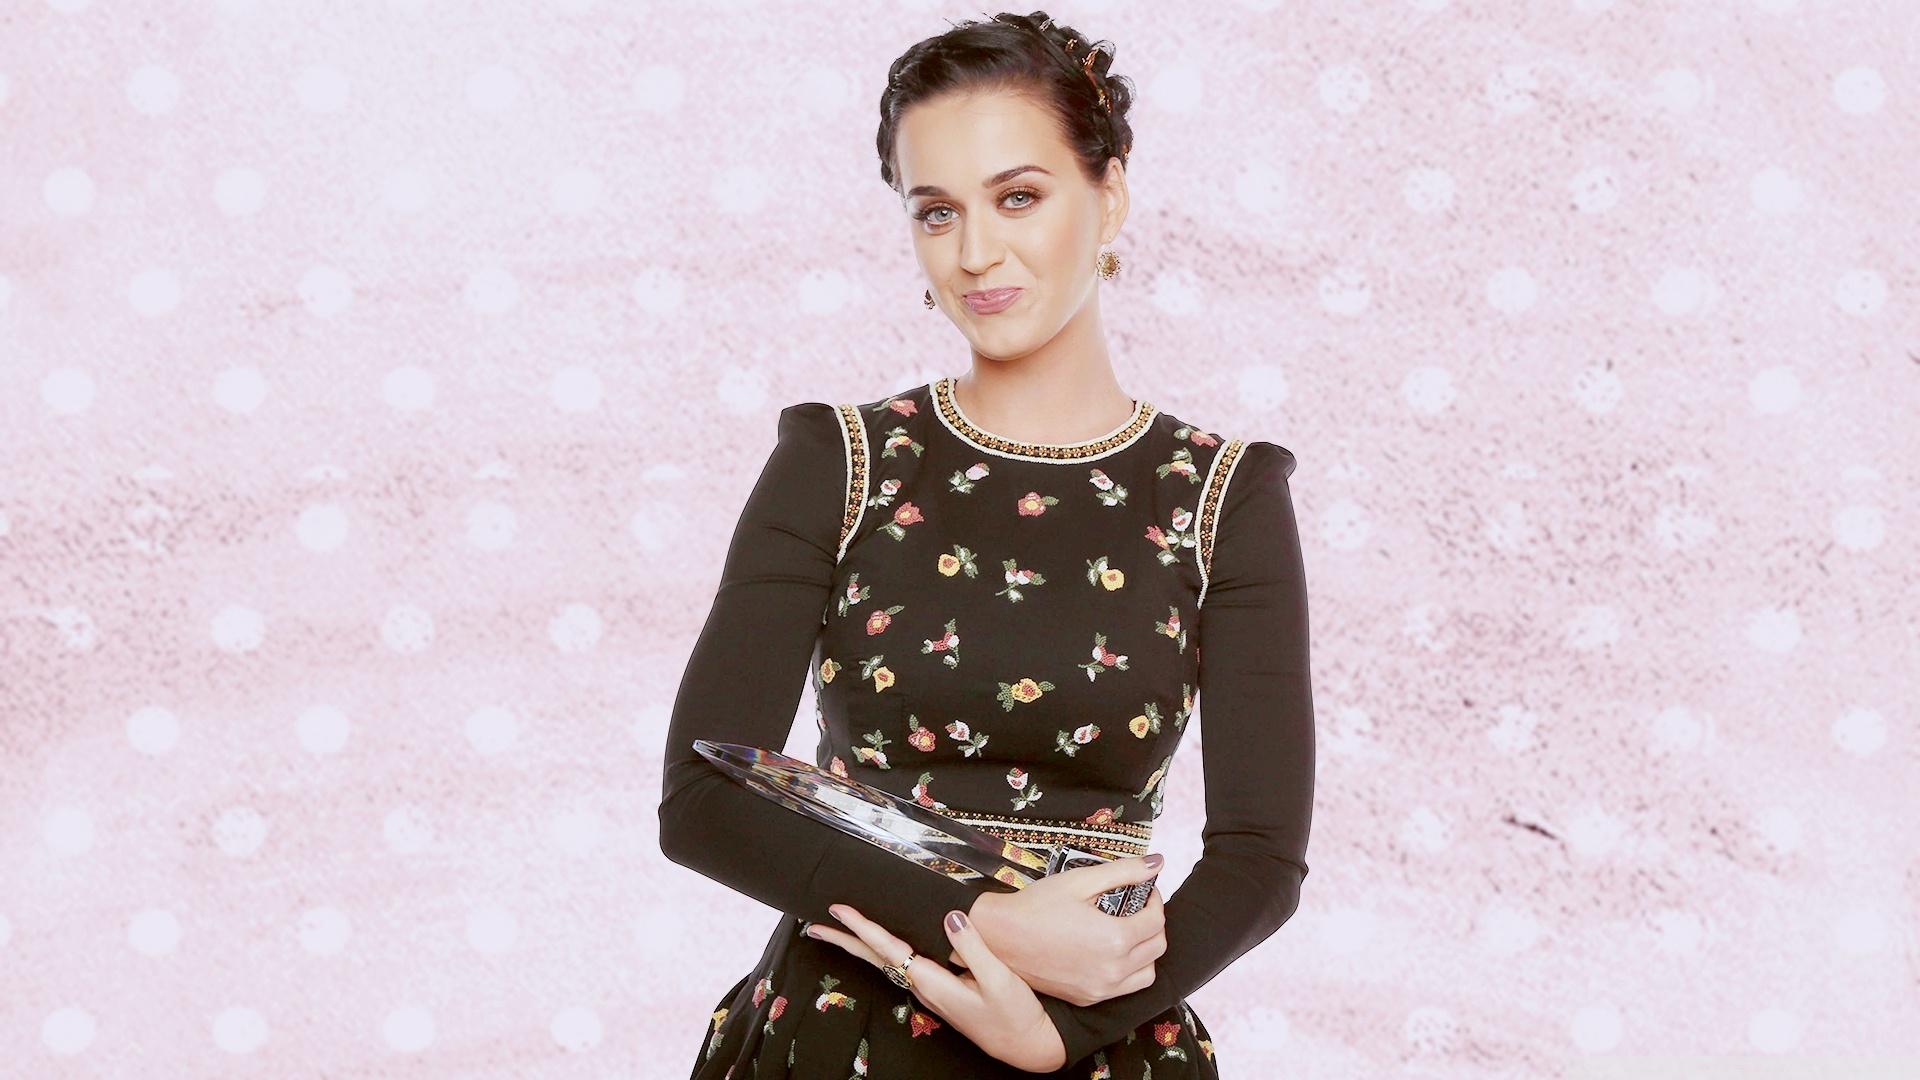 Katy Perry Wallpaper 14